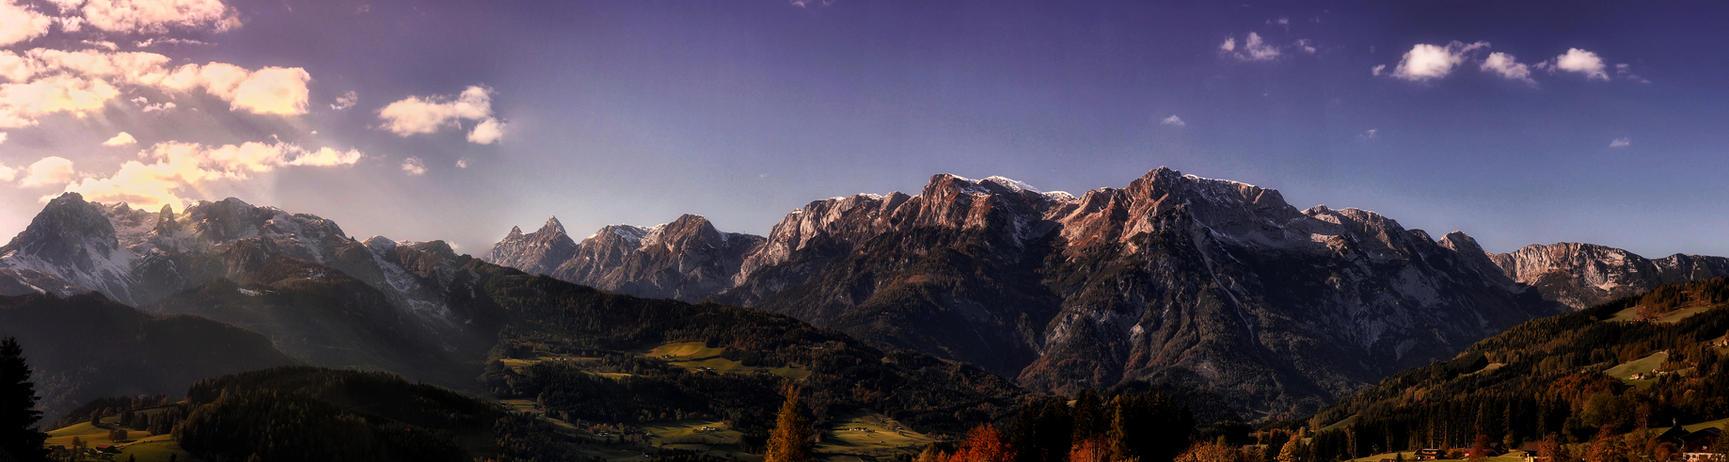 Panorama_autumn_2011_1 by LeronMasoN